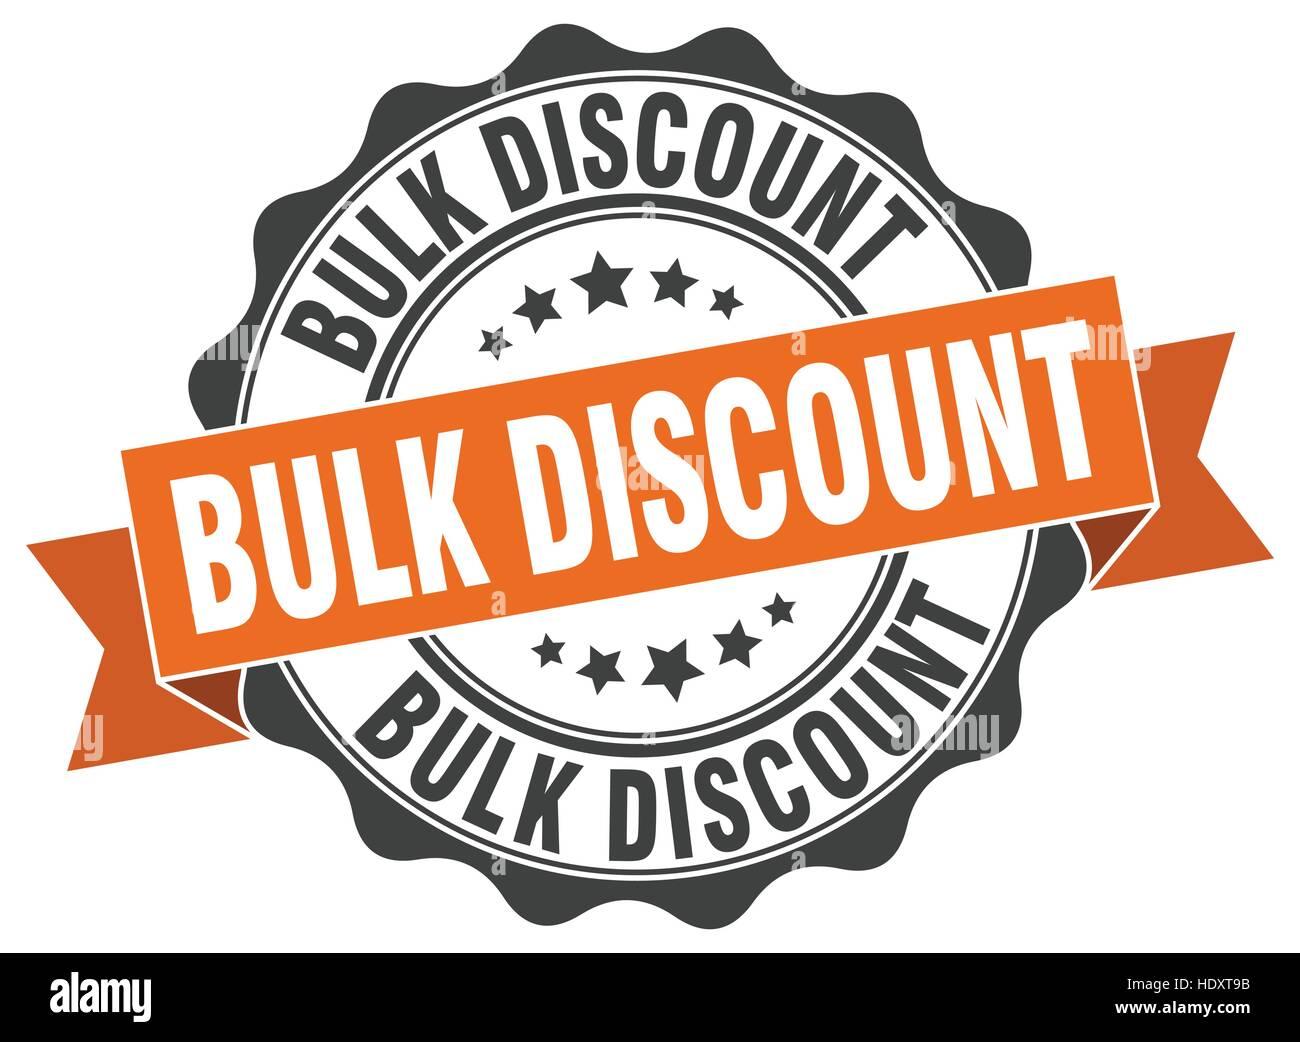 bulk discount stamp sign seal stock vector art illustration